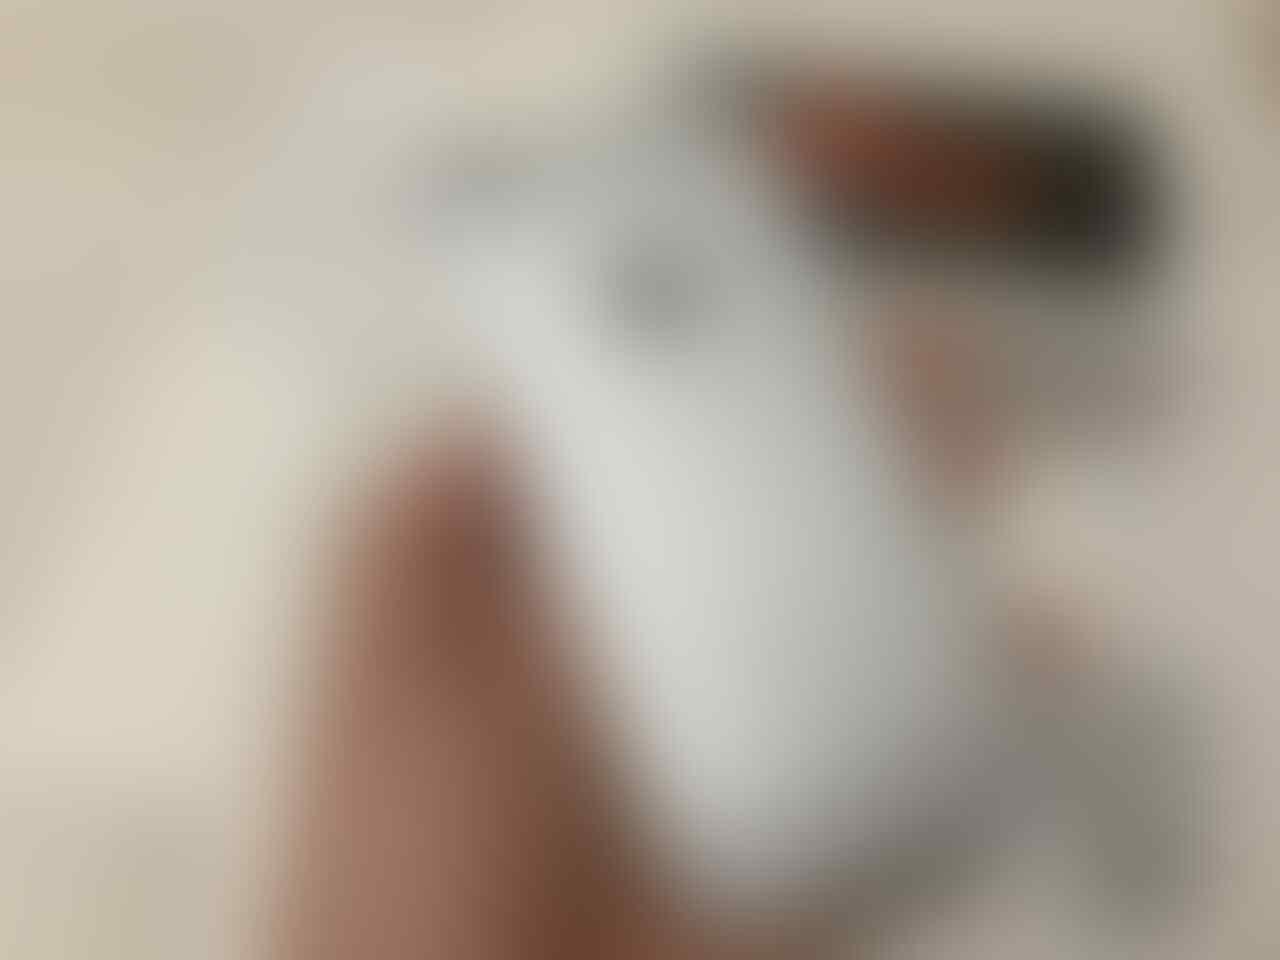 IPHONE 6S GREY 64GB FU FULLSET MURAAH 4600 SAJA [MALANG]